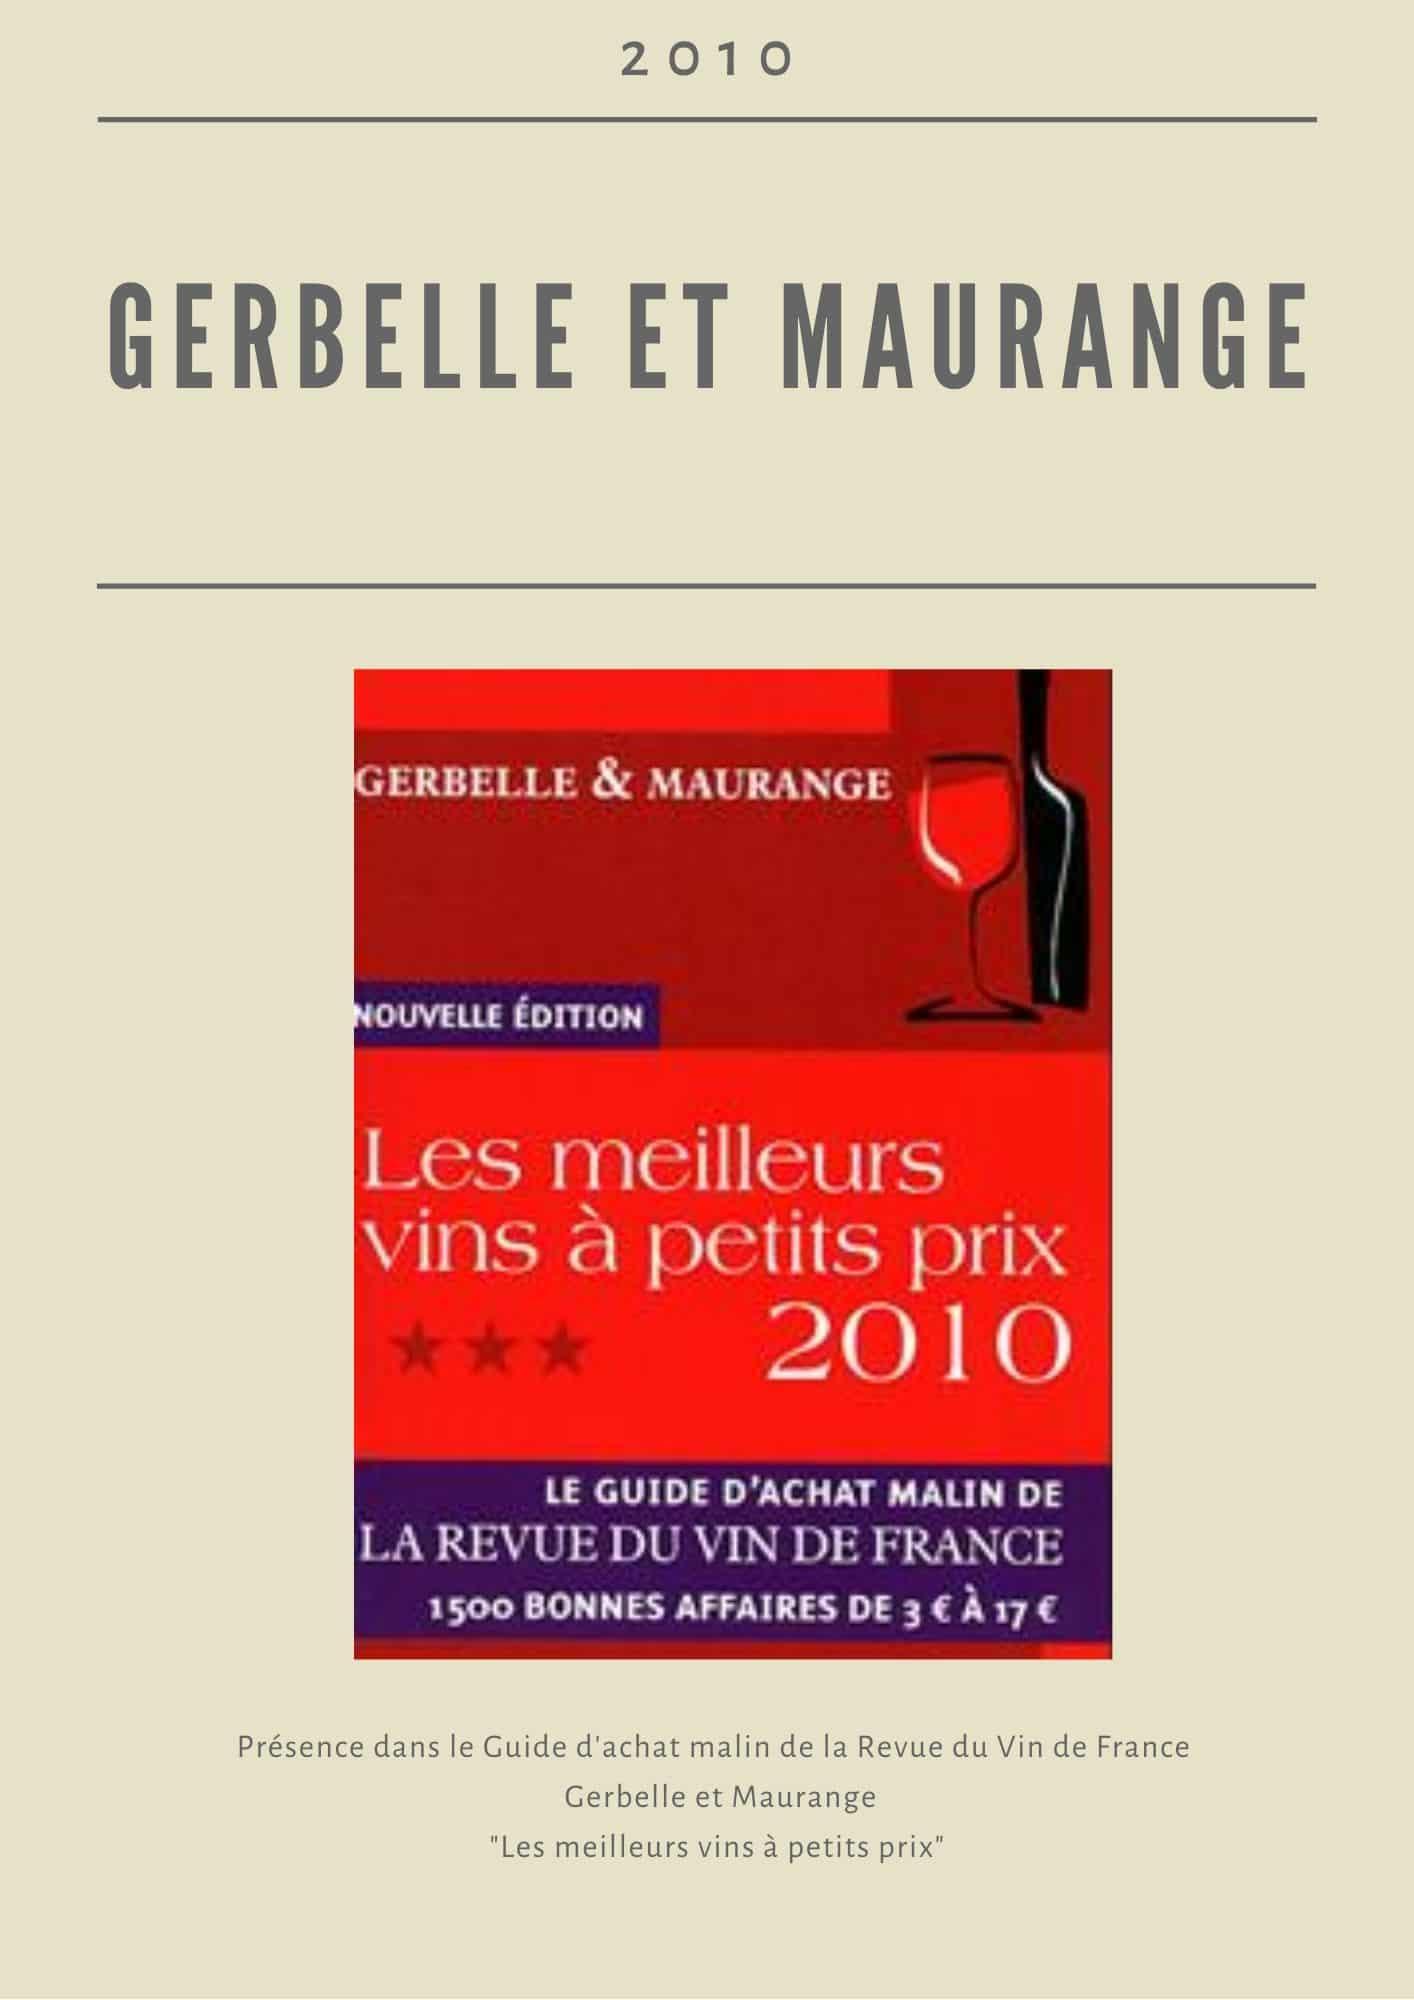 Gerbelle & Maurange